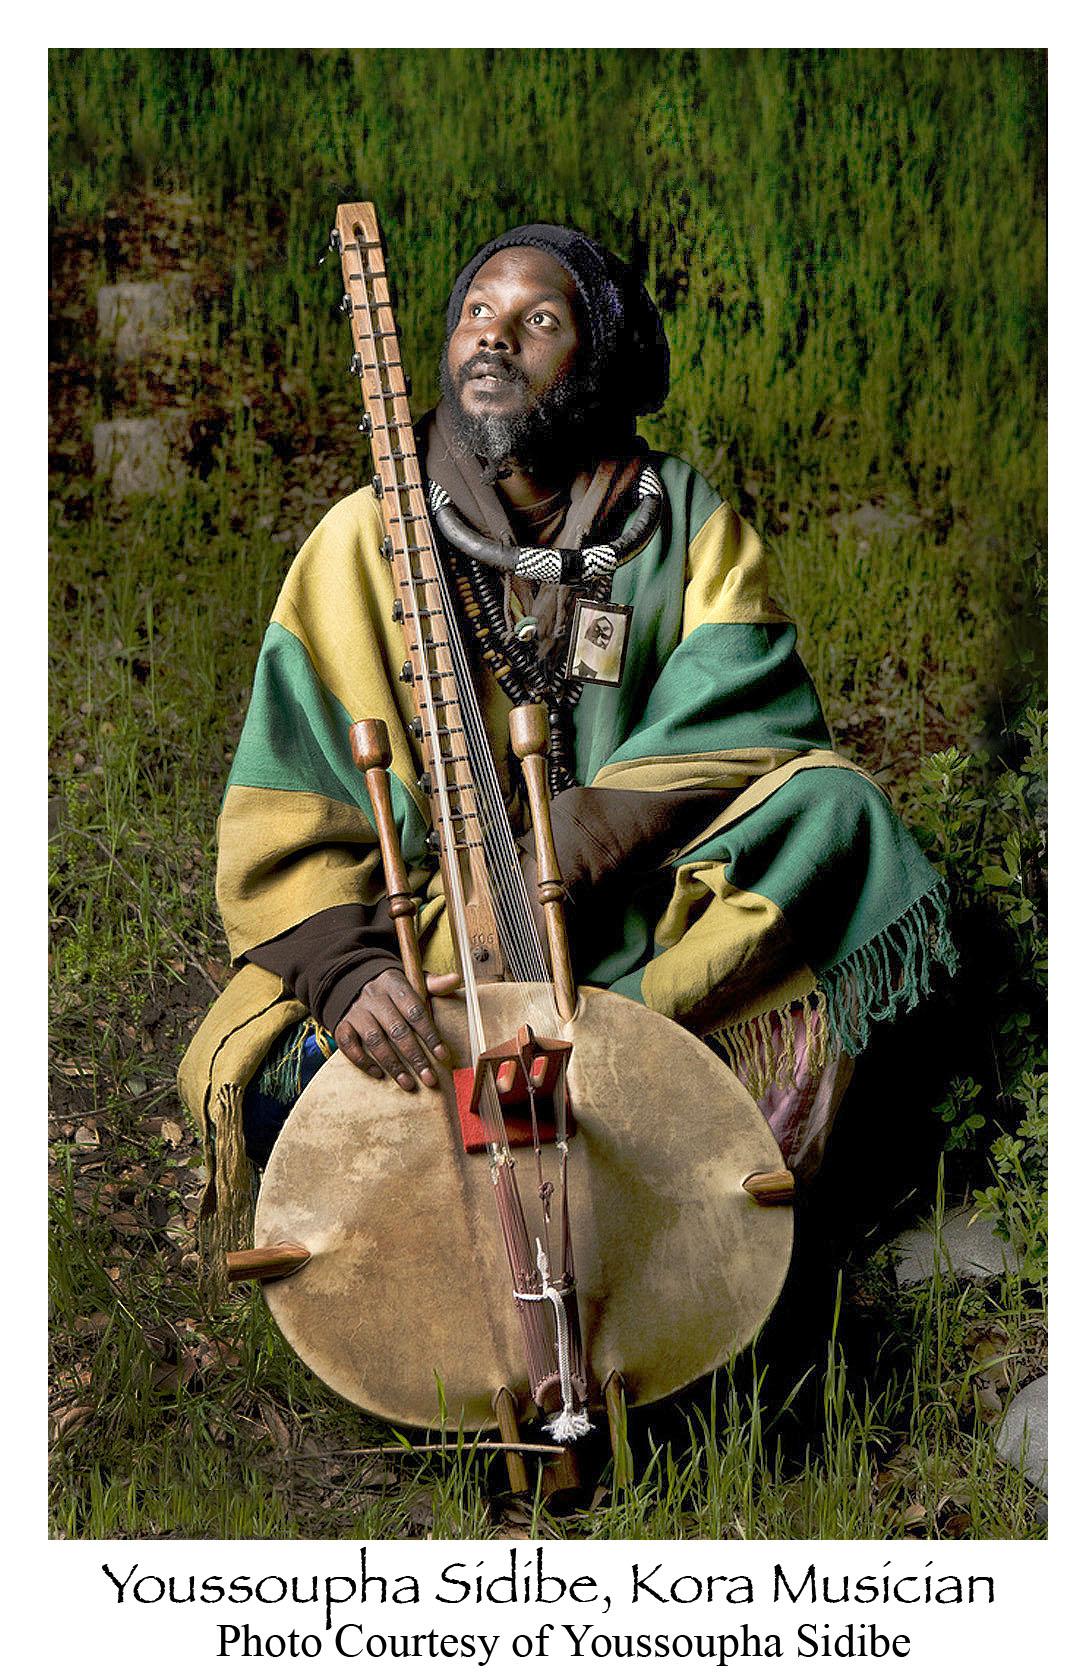 Youssoupha Sidibe kora musician 052016